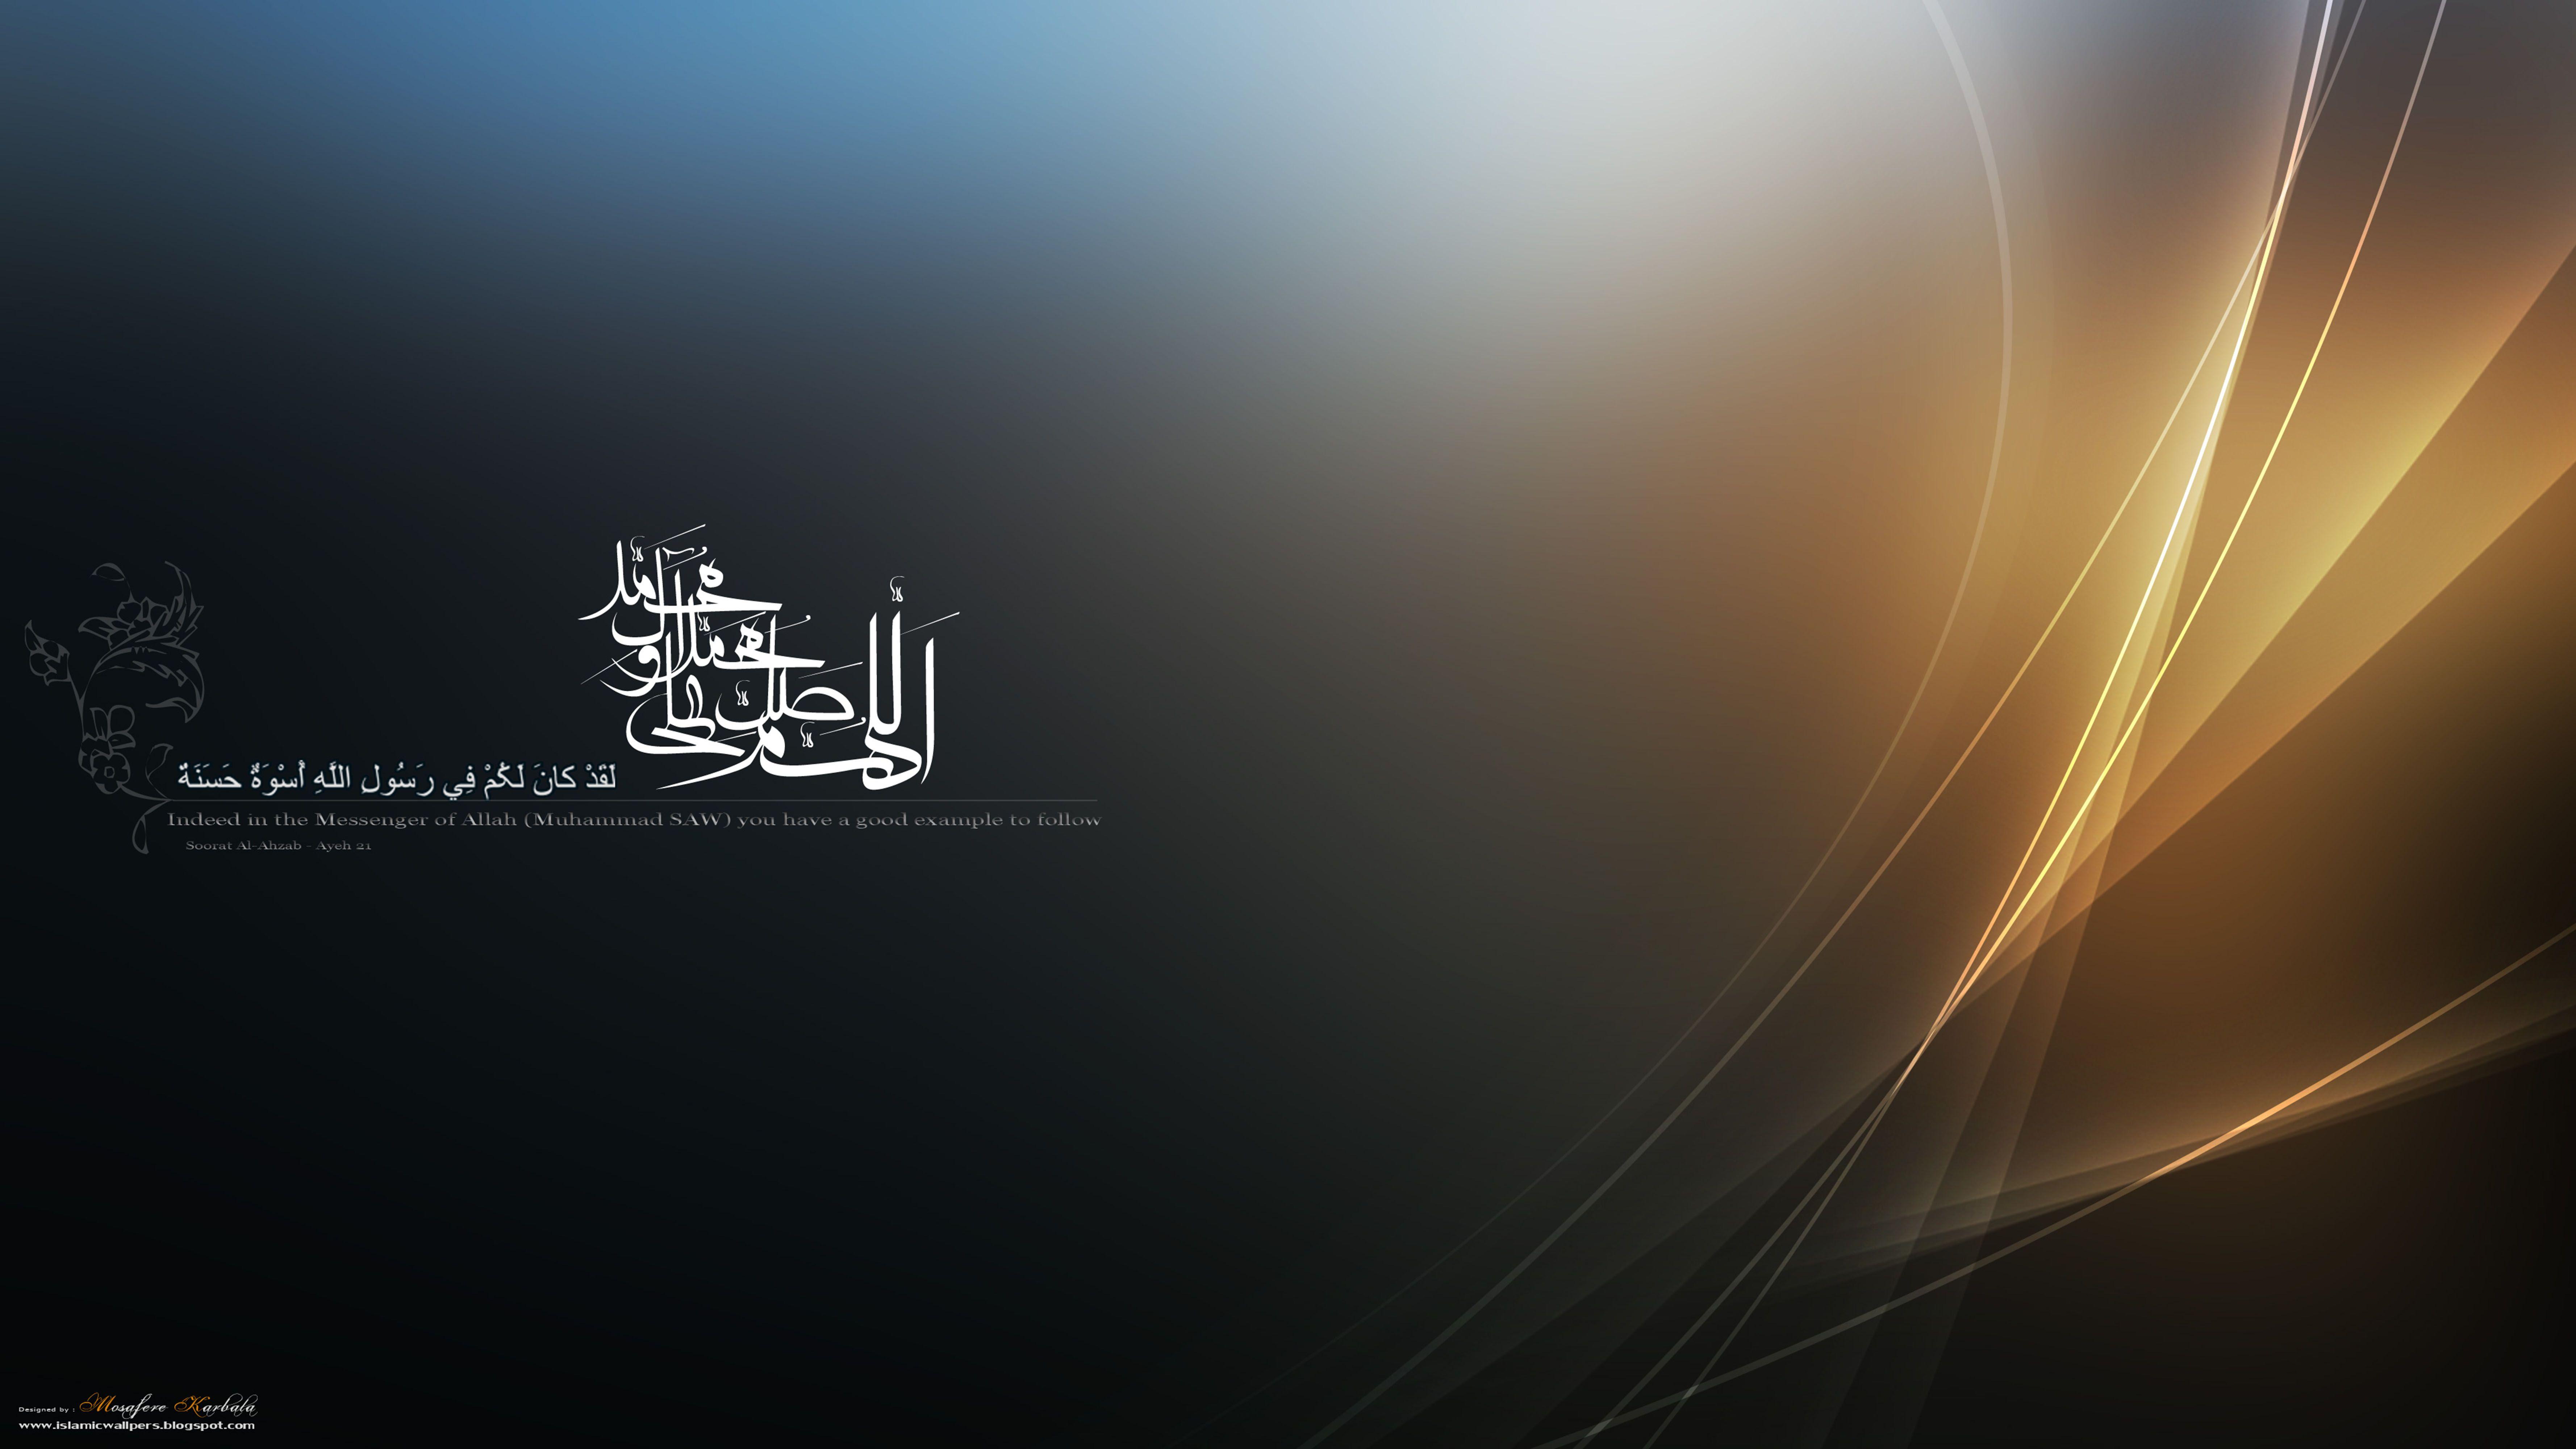 Islamic Wallpaper Fotografi hitam putih, Gambar